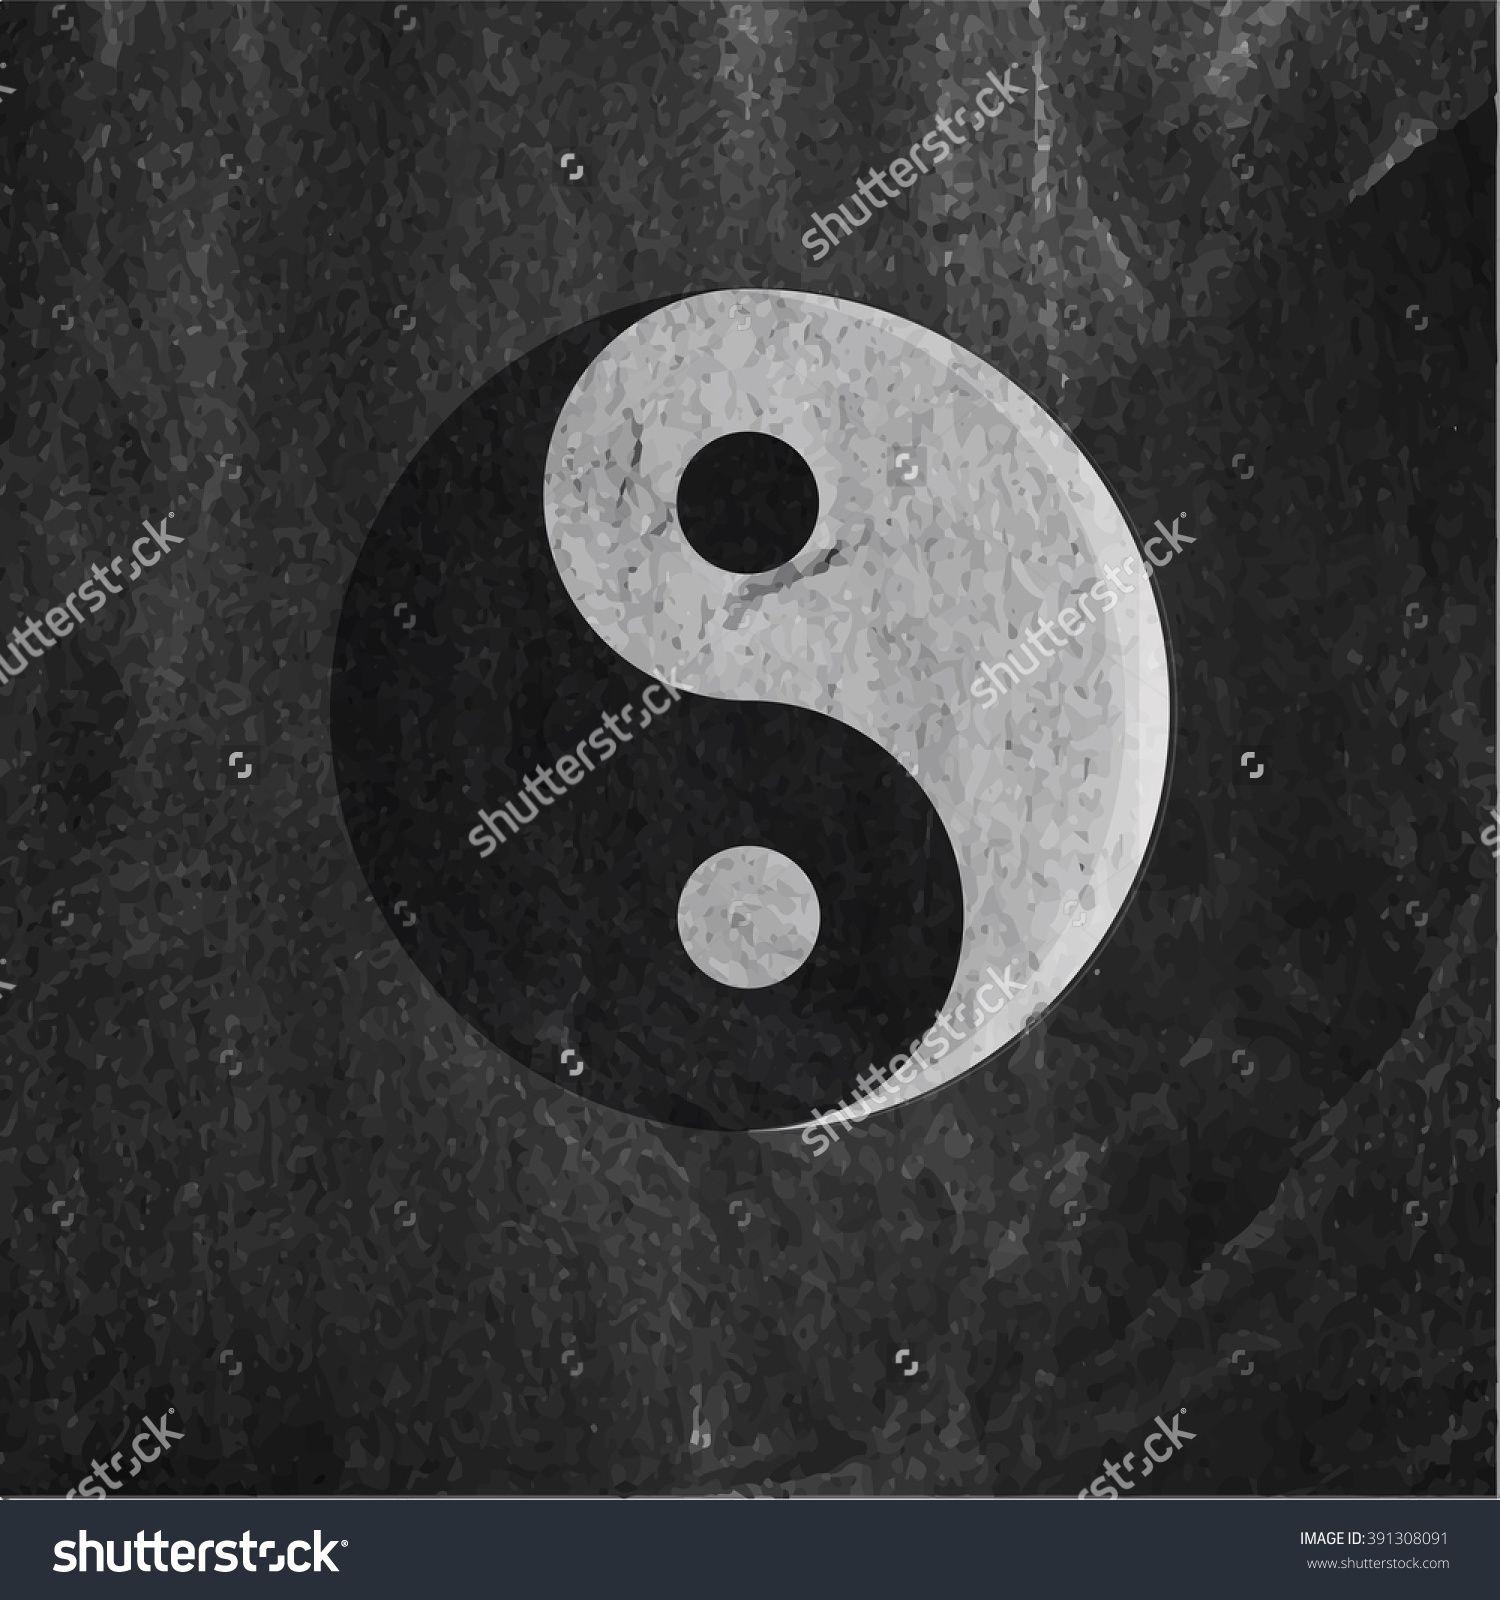 Ying Yang Symbol Of Harmony And Balance. Ancient Chinese Symbol. Sacred Geometry. Стоковая векторная иллюстрация 391308091 : Shutterstock